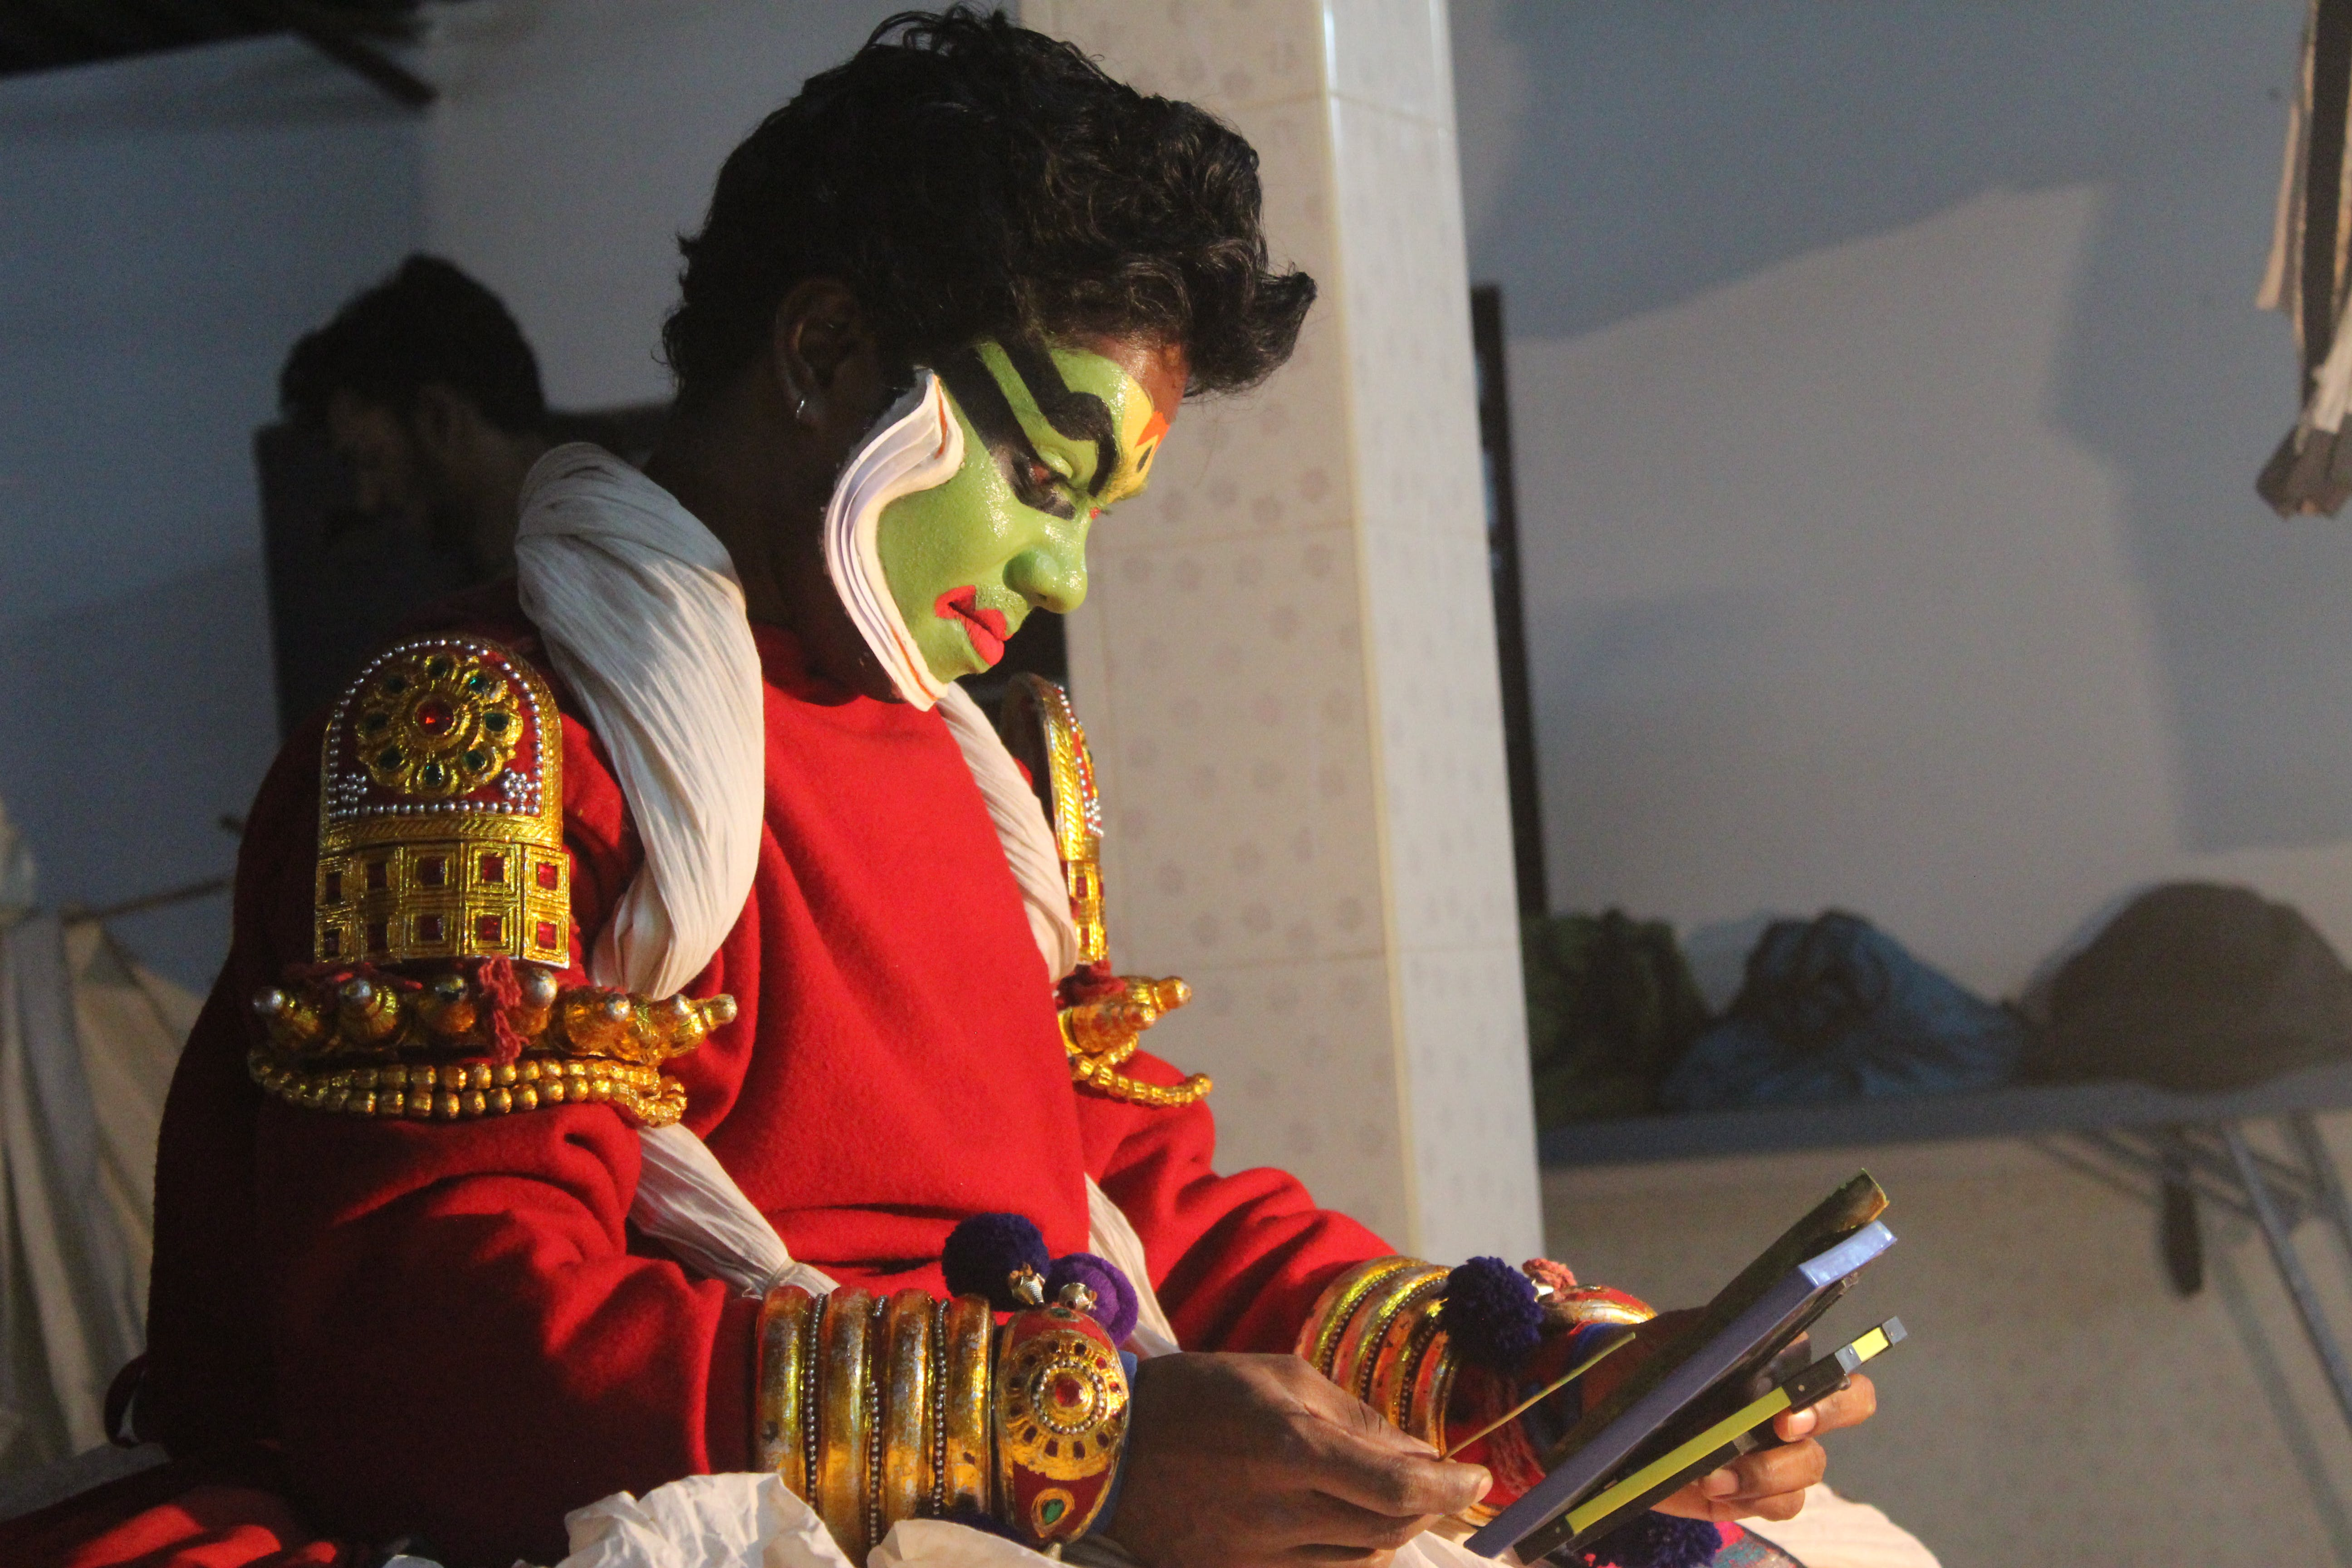 Základová fotografie zdarma na téma kathakali, kathakali make-up, kathakali obvaz, kathakali tanec